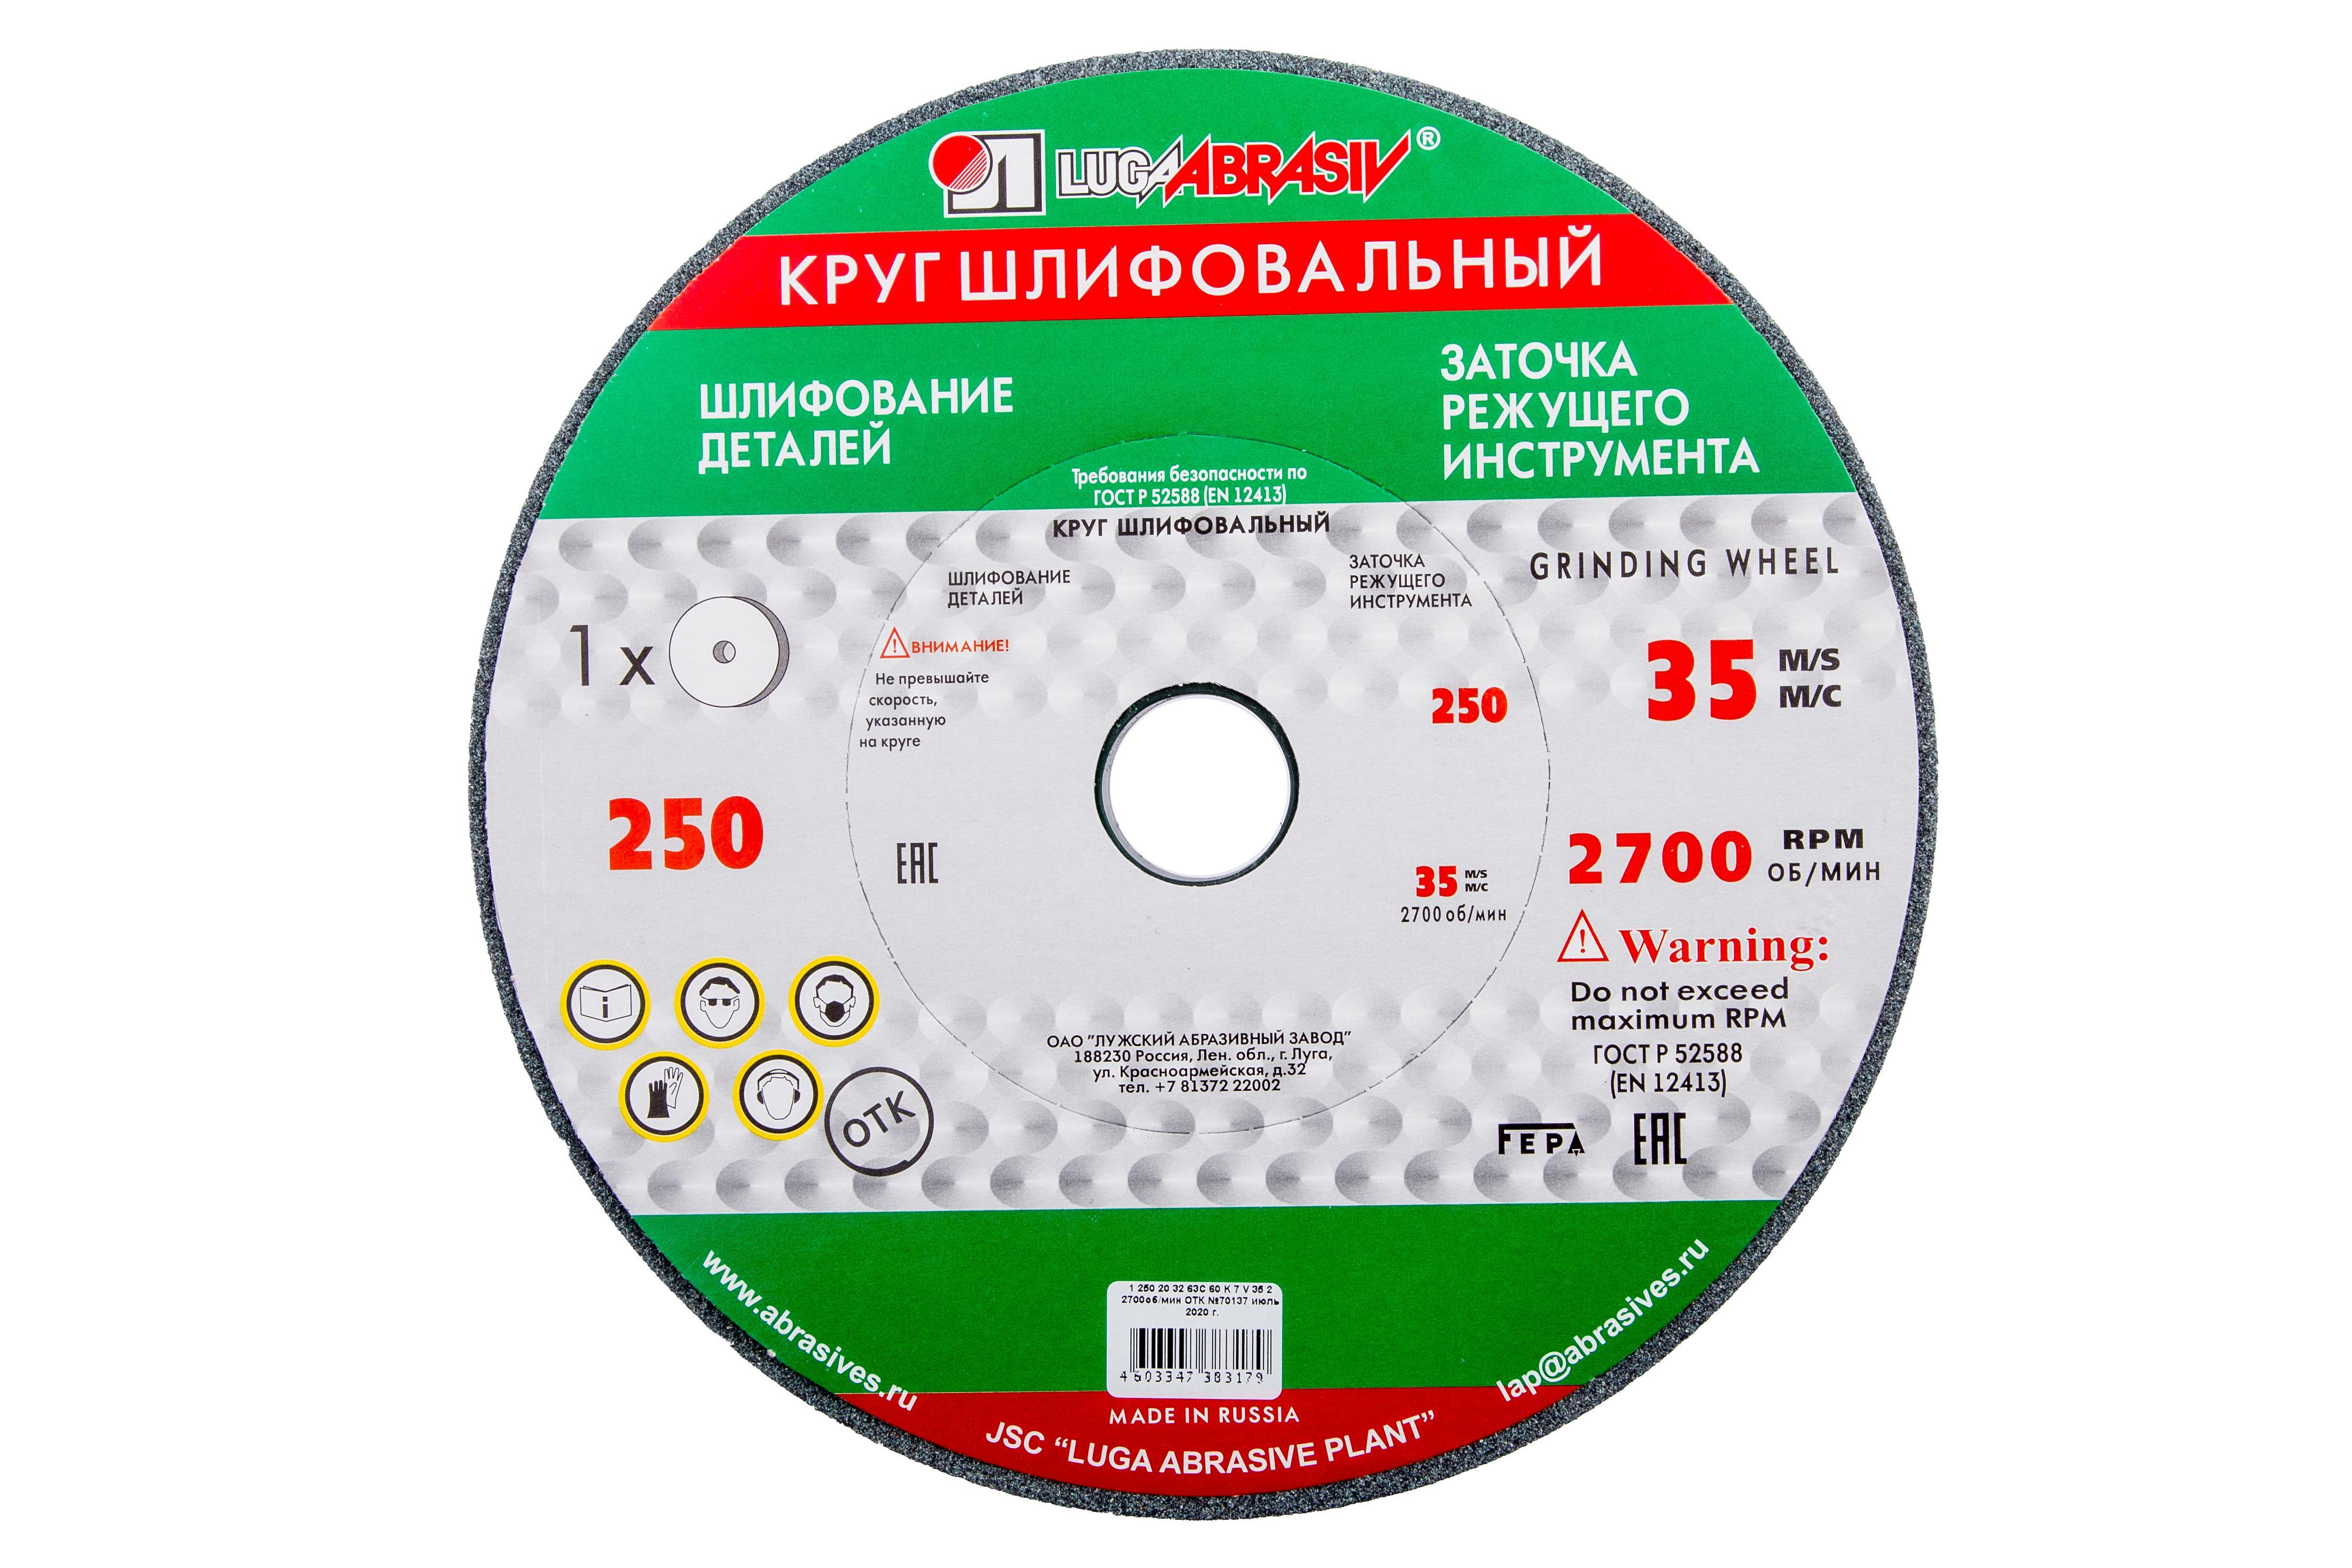 Круг шлифовальный ЛУГА-АБРАЗИВ 1 250 Х 20 Х 32 63С 60 k,l ваза mughal l 20 х 20 х 30 см